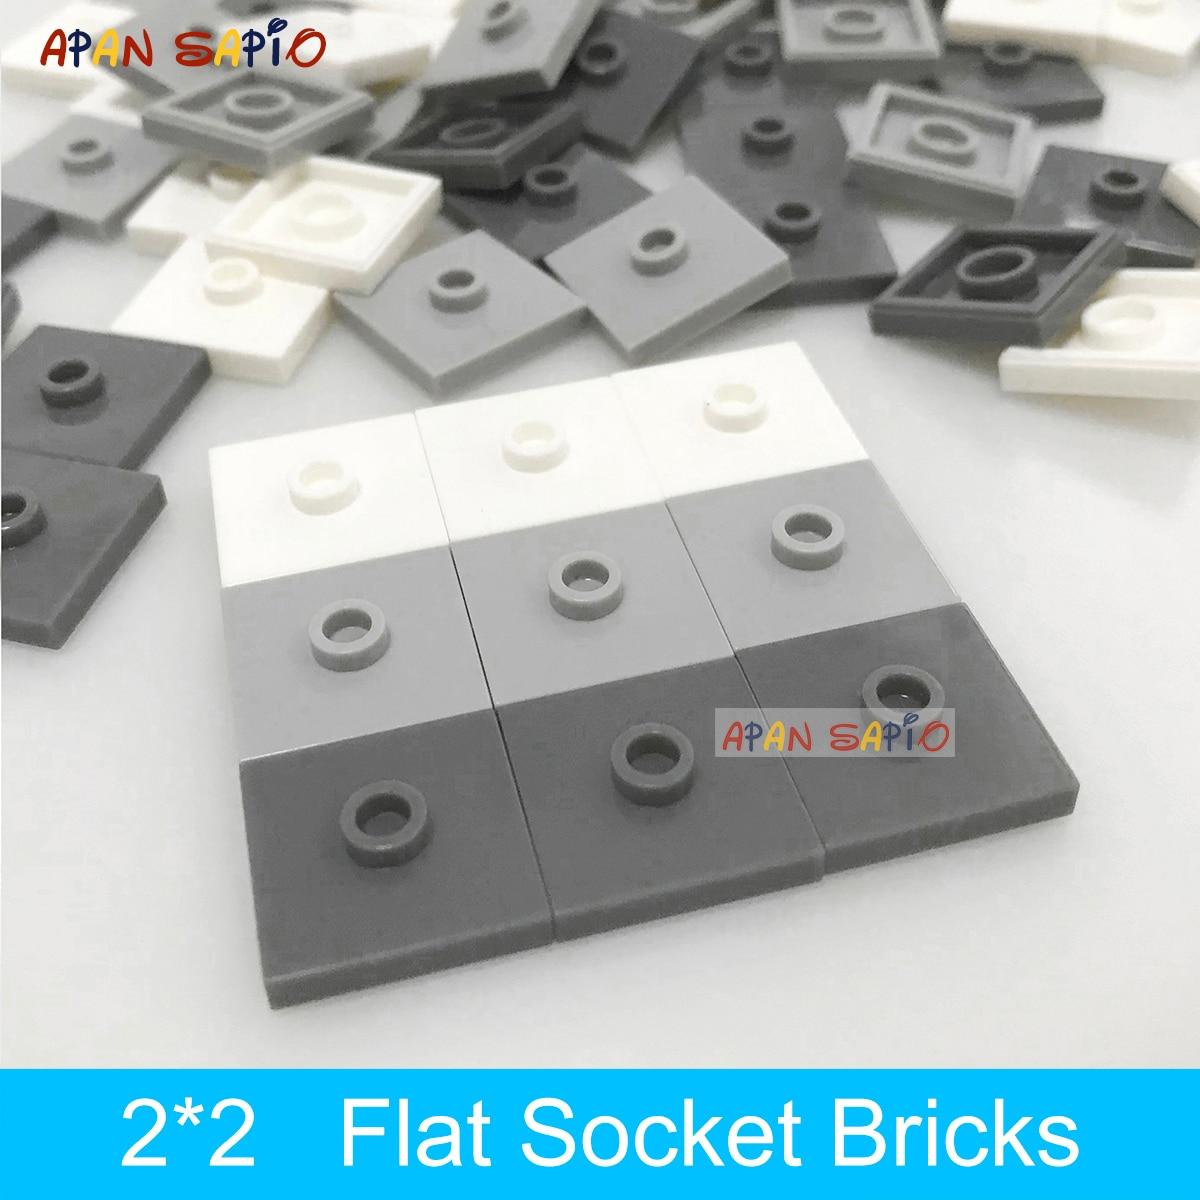 50pcs DIY Building Blocks Convex Seat Bricks 2x2 Dots Educational Plastic Toys for Children Compatible Brands Kids Gifts 87580